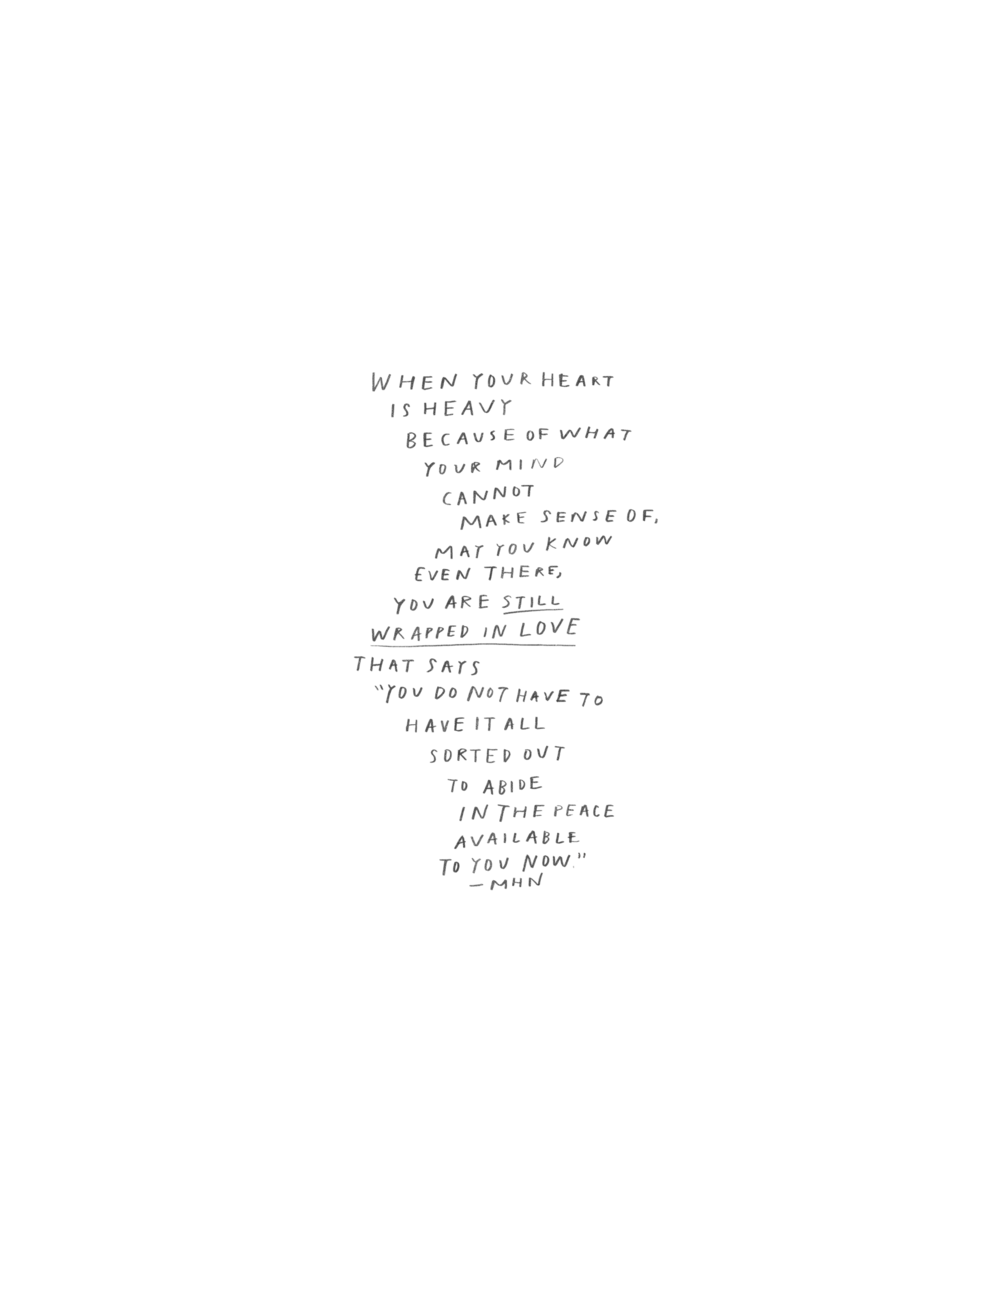 File_001 (65).png